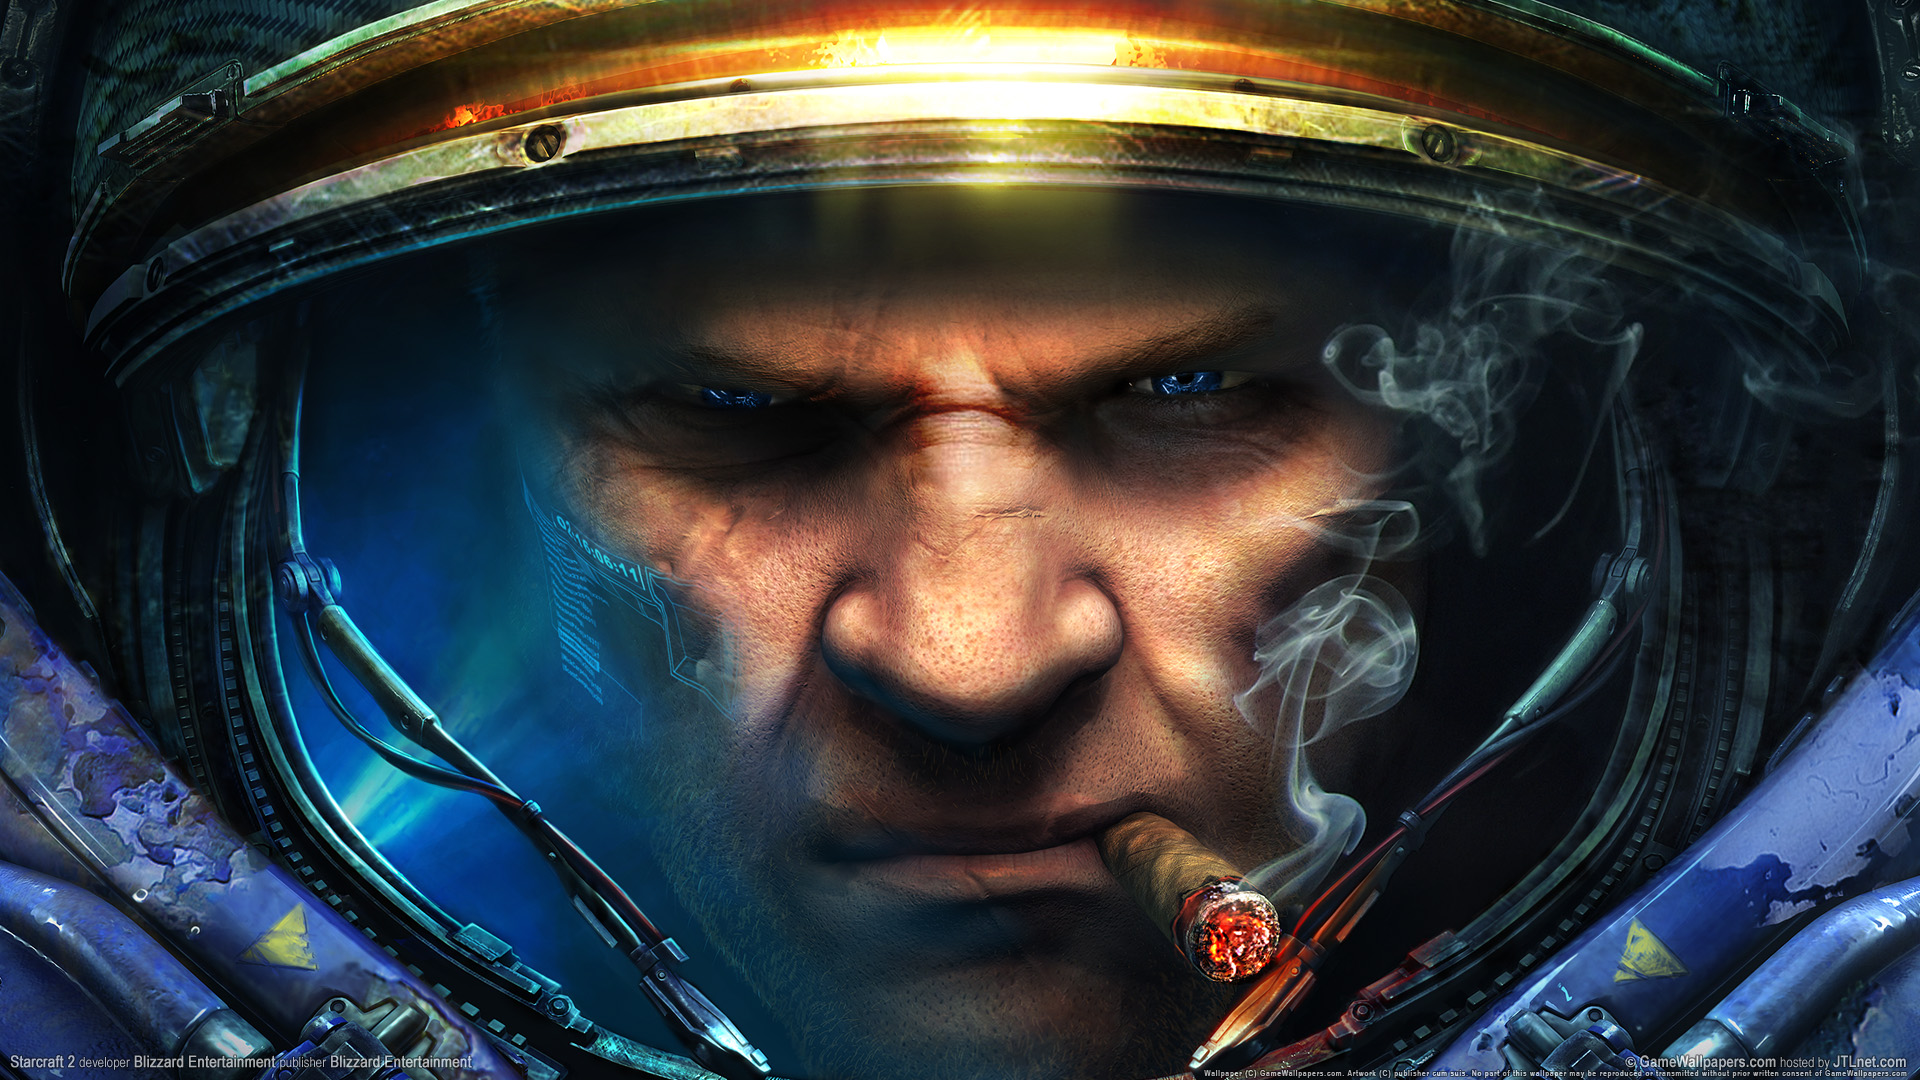 Gaming Wallpaper full hd starcraft epic face blue eye 1920x1080